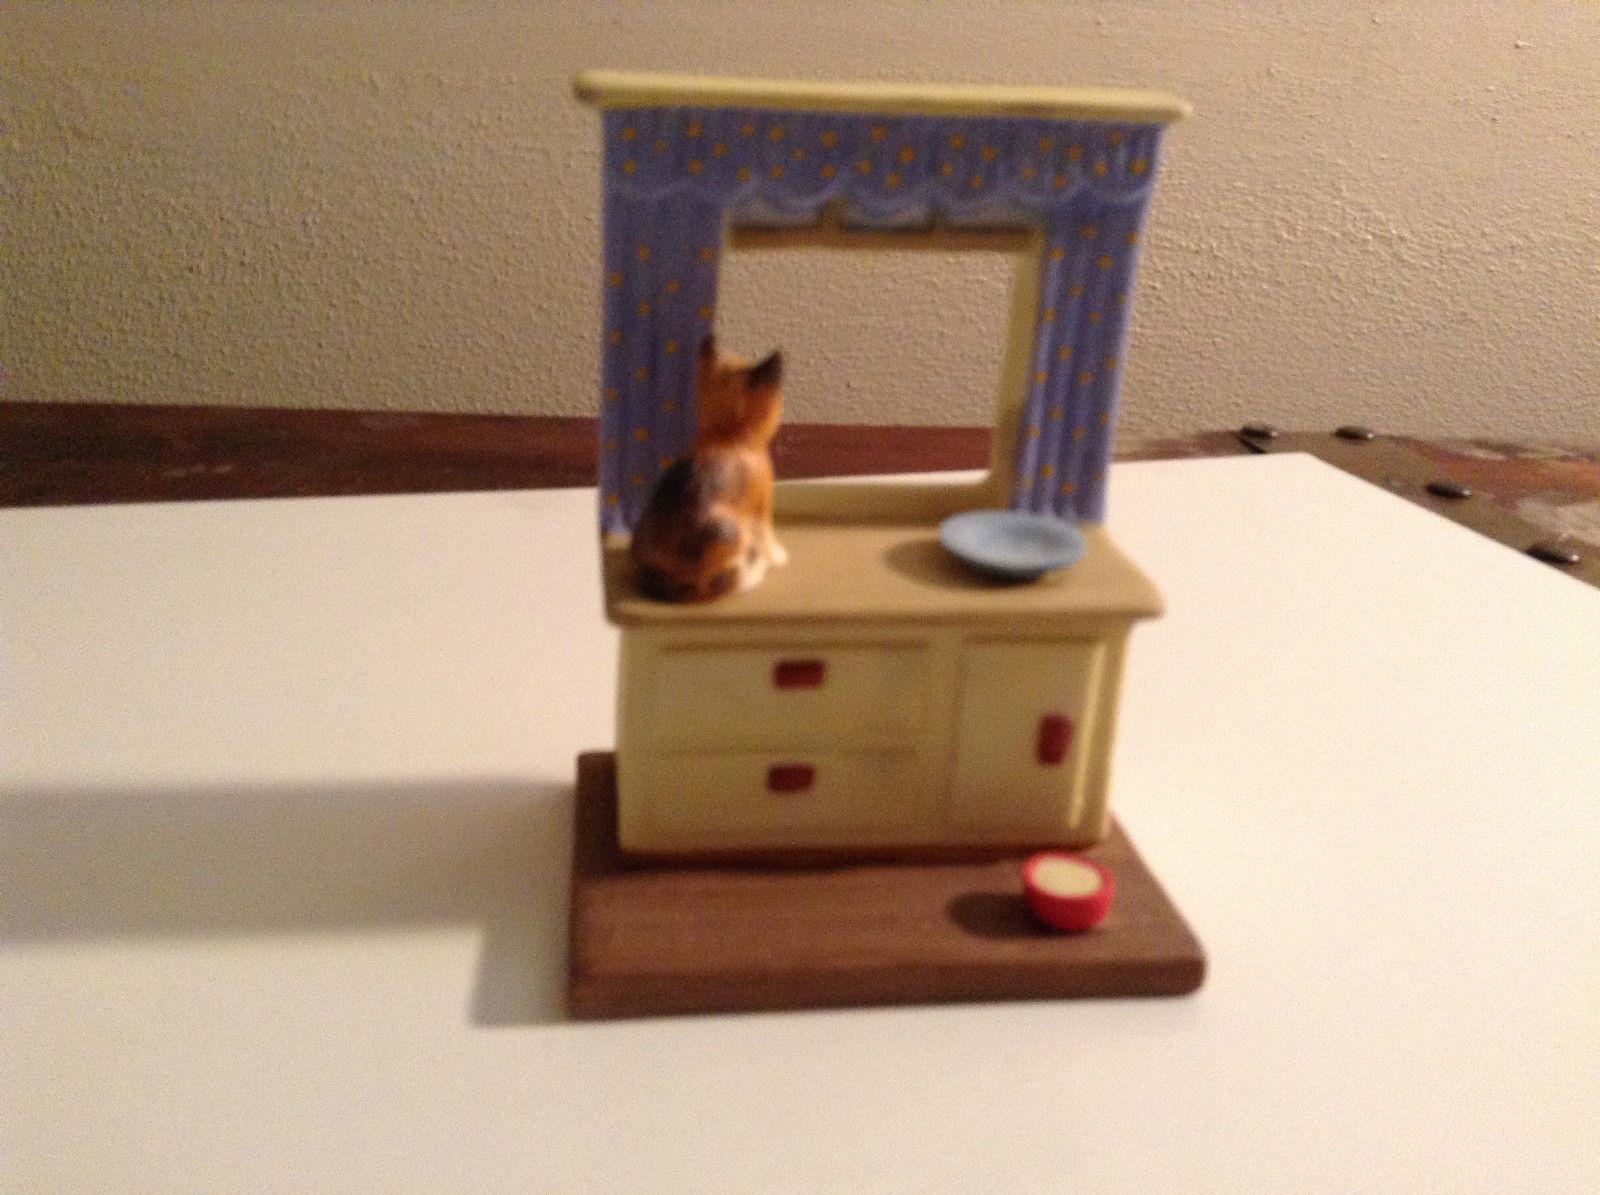 Cute Cats Danbury Kitten on Kitchen Counter Window Porcelain Figurine